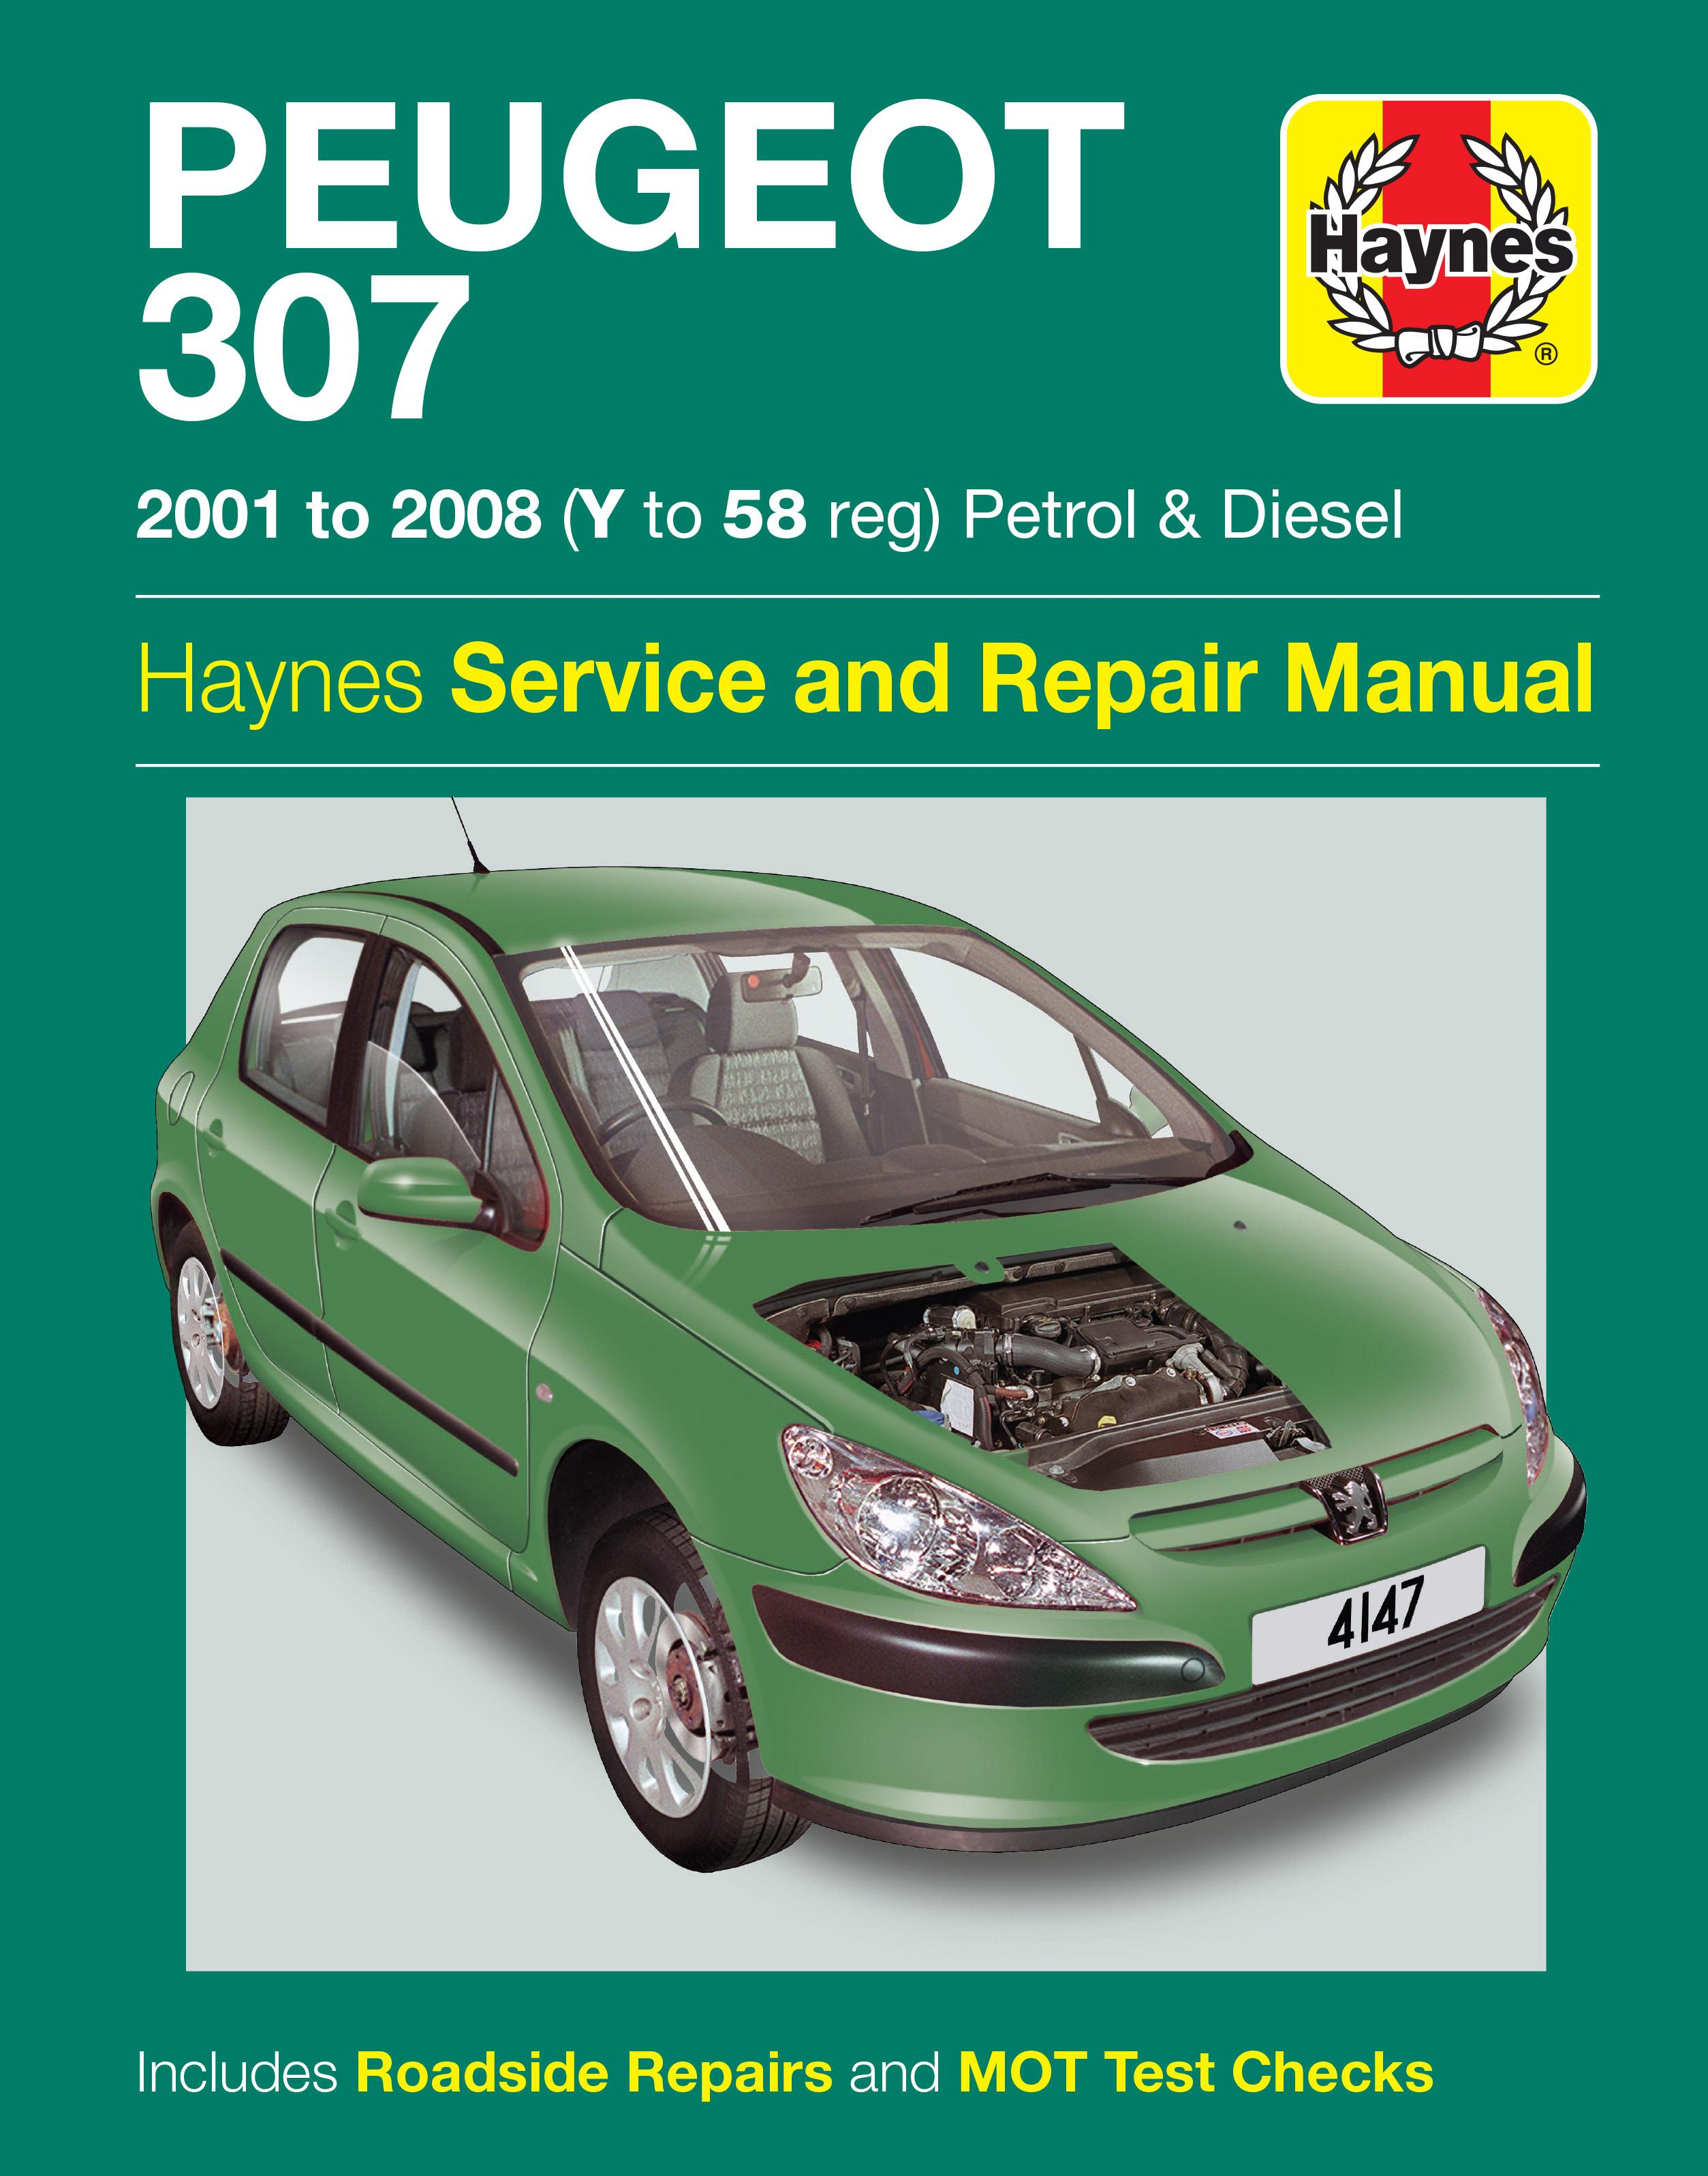 peugeot 307 manual rh xn 80addcipy8c6e ihergetsum com Peugeot 307 SW Windsheel Wiper Motor Peugeot 307 SW Starter 2003